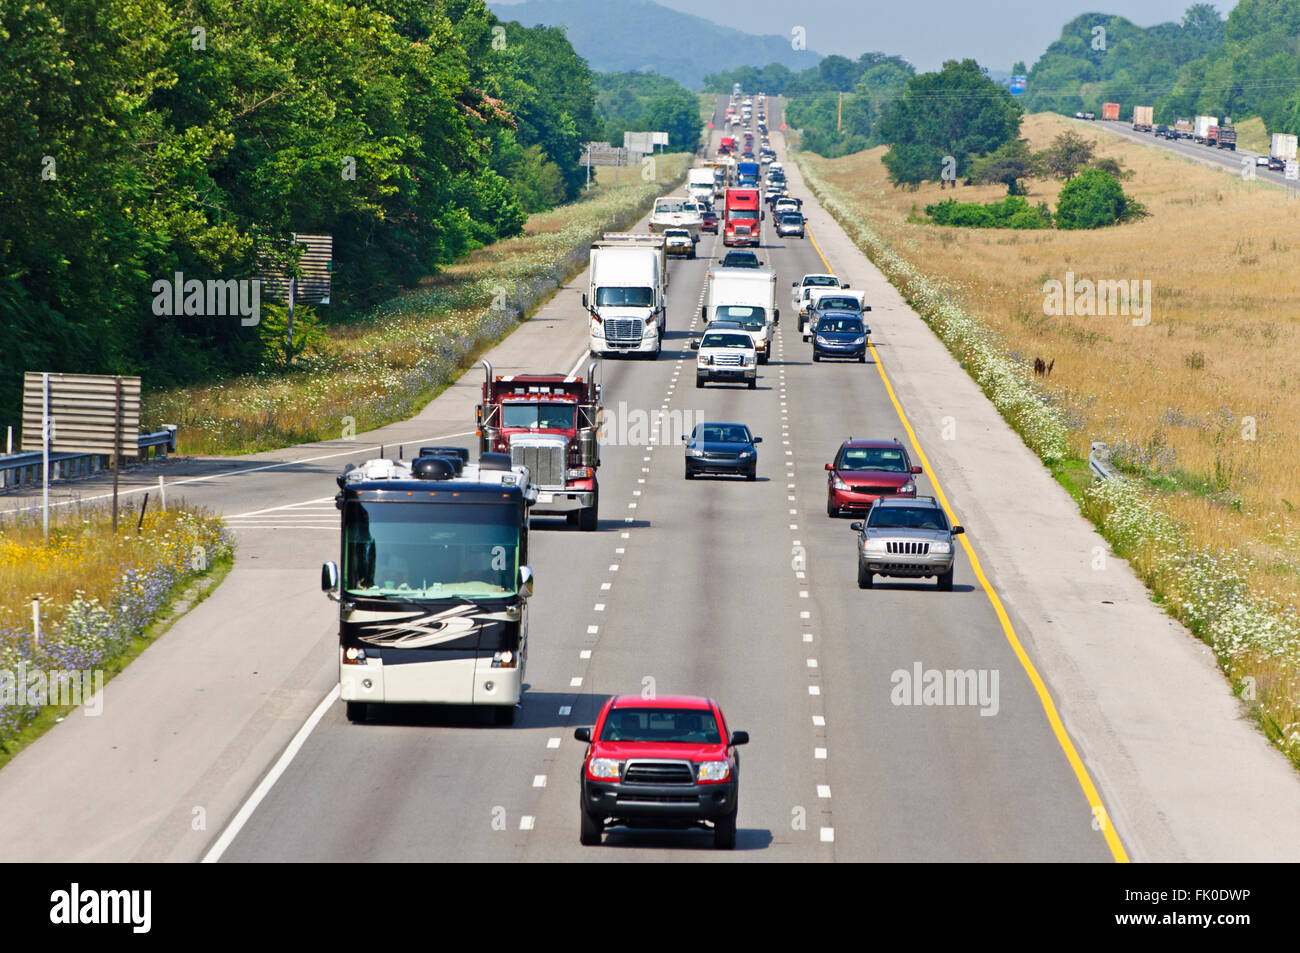 Heavy Summertime Interstate Traffic - Stock Image